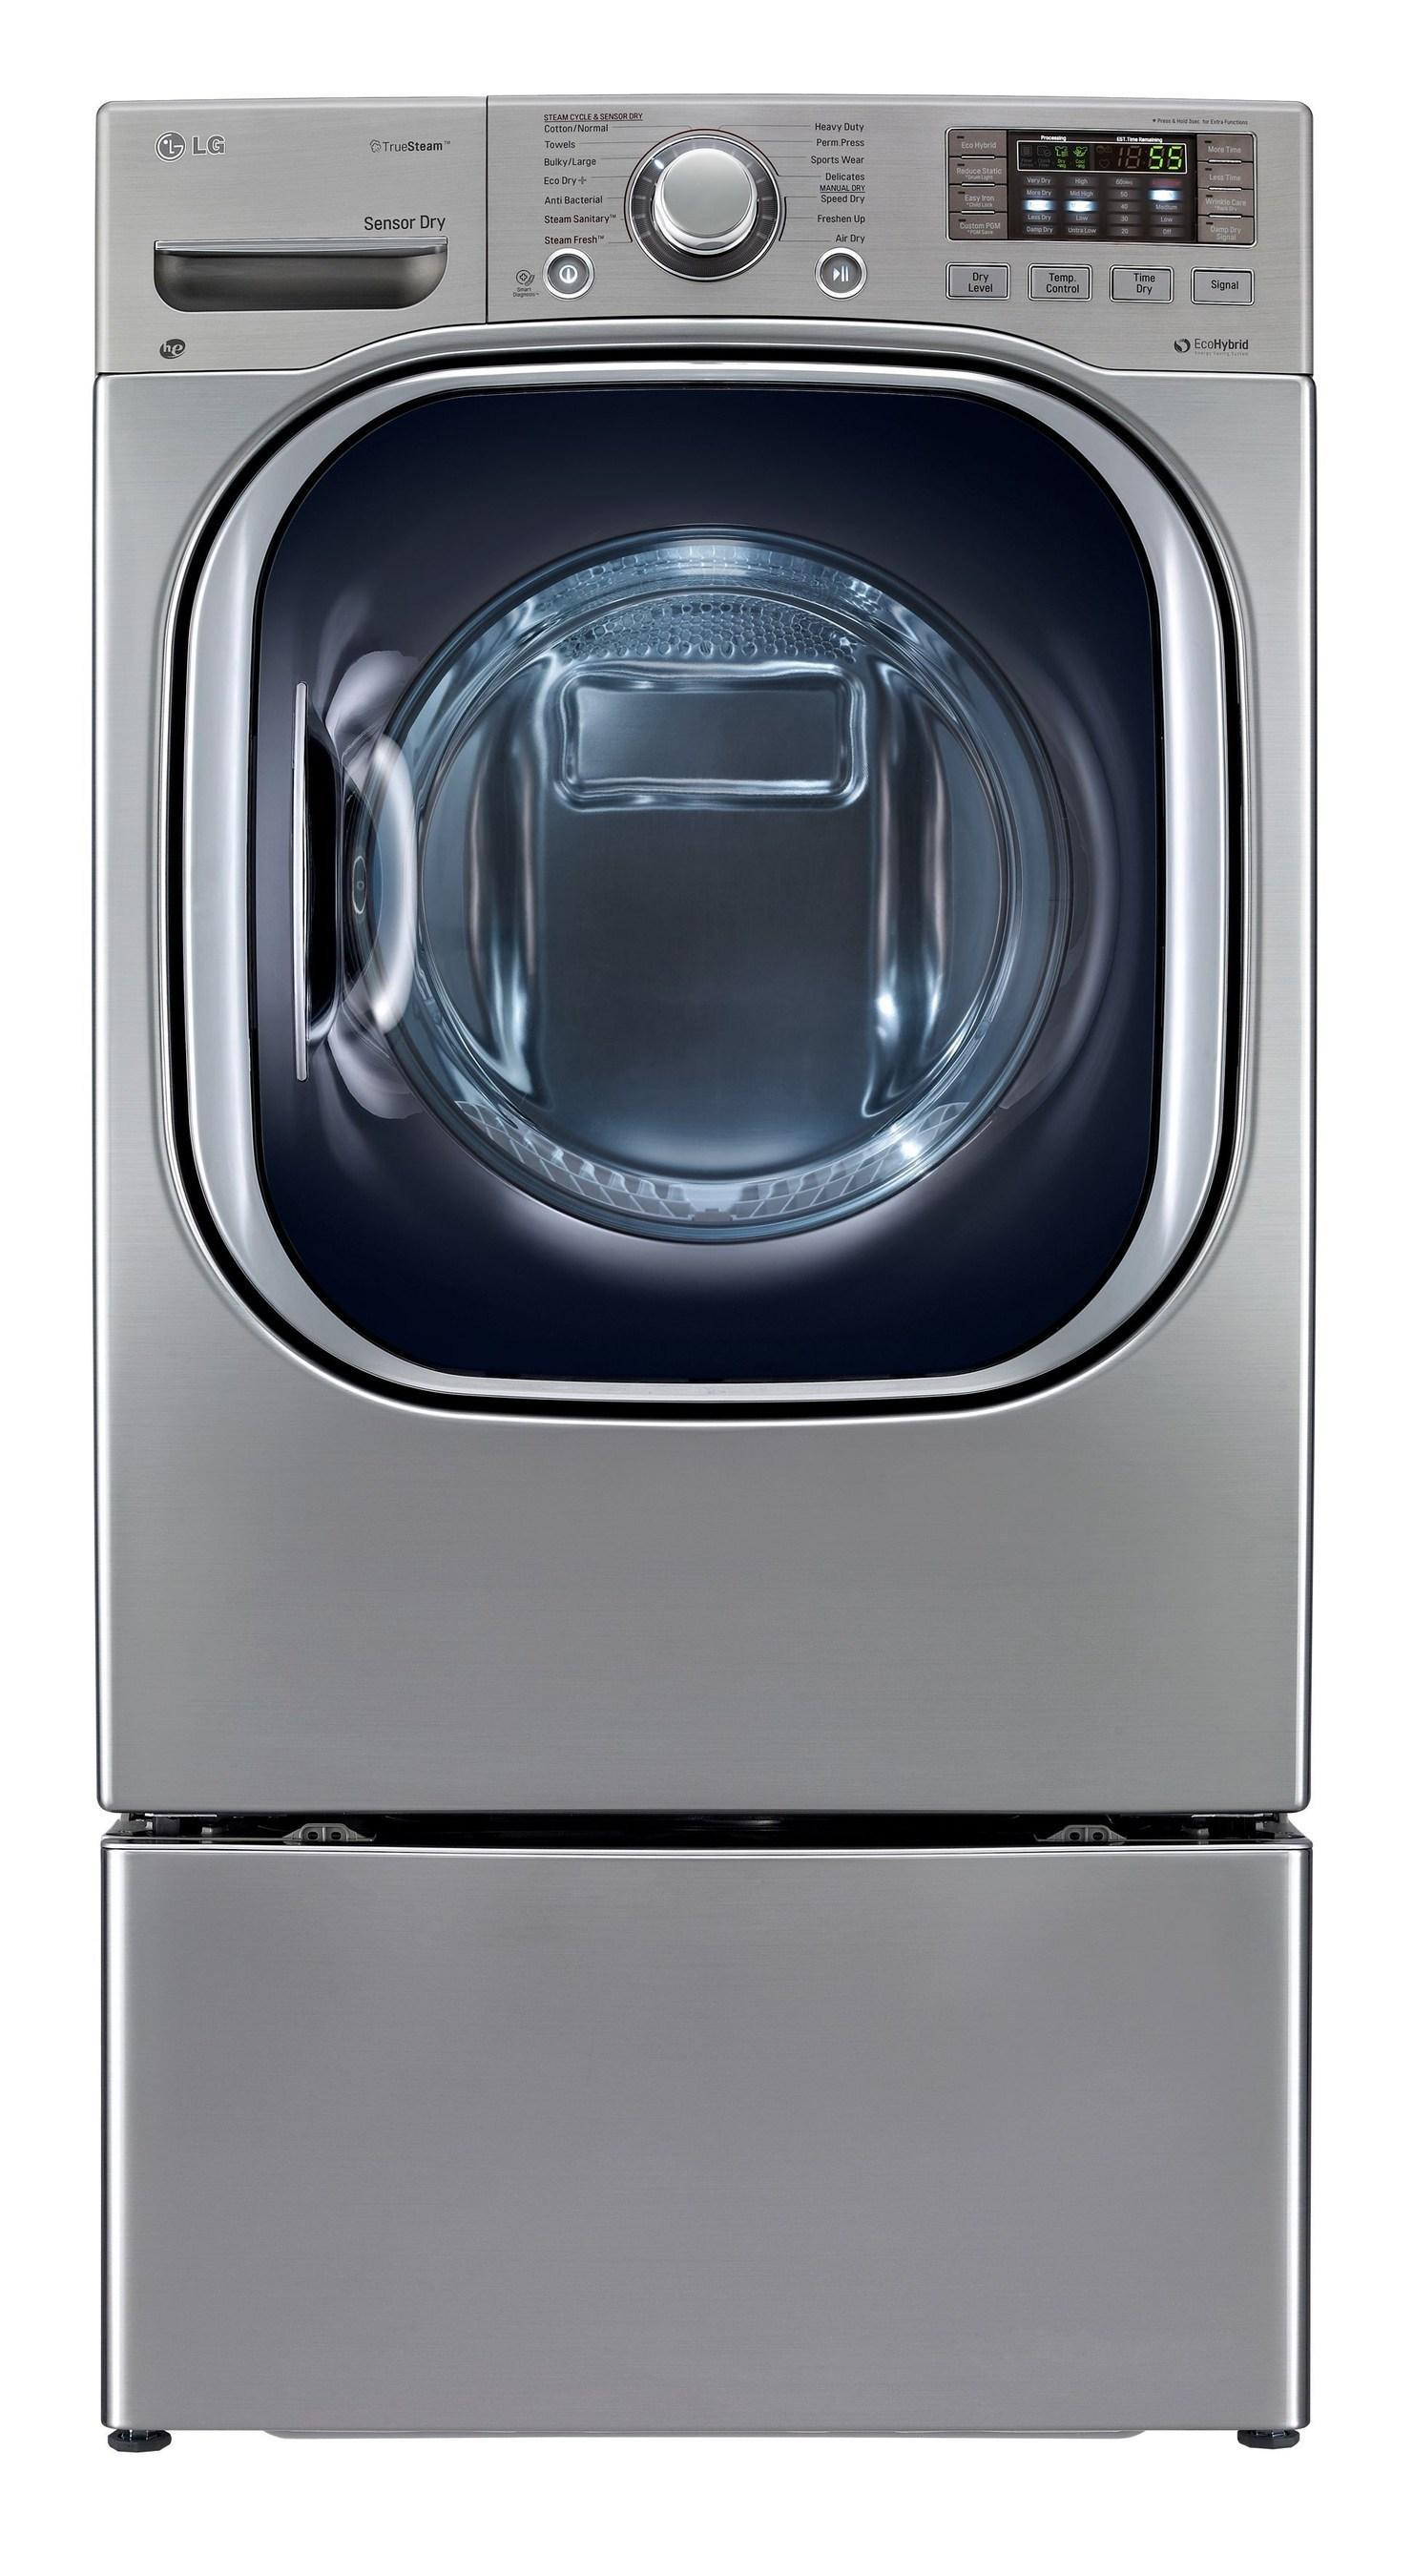 LG ECOHYBRID HEAT PUMP DRYER EARNS 2014 ENERGY STAR(R) EMERGING TECHNOLOGY AWARD. (PRNewsFoto/LG Electronics USA, Inc.)